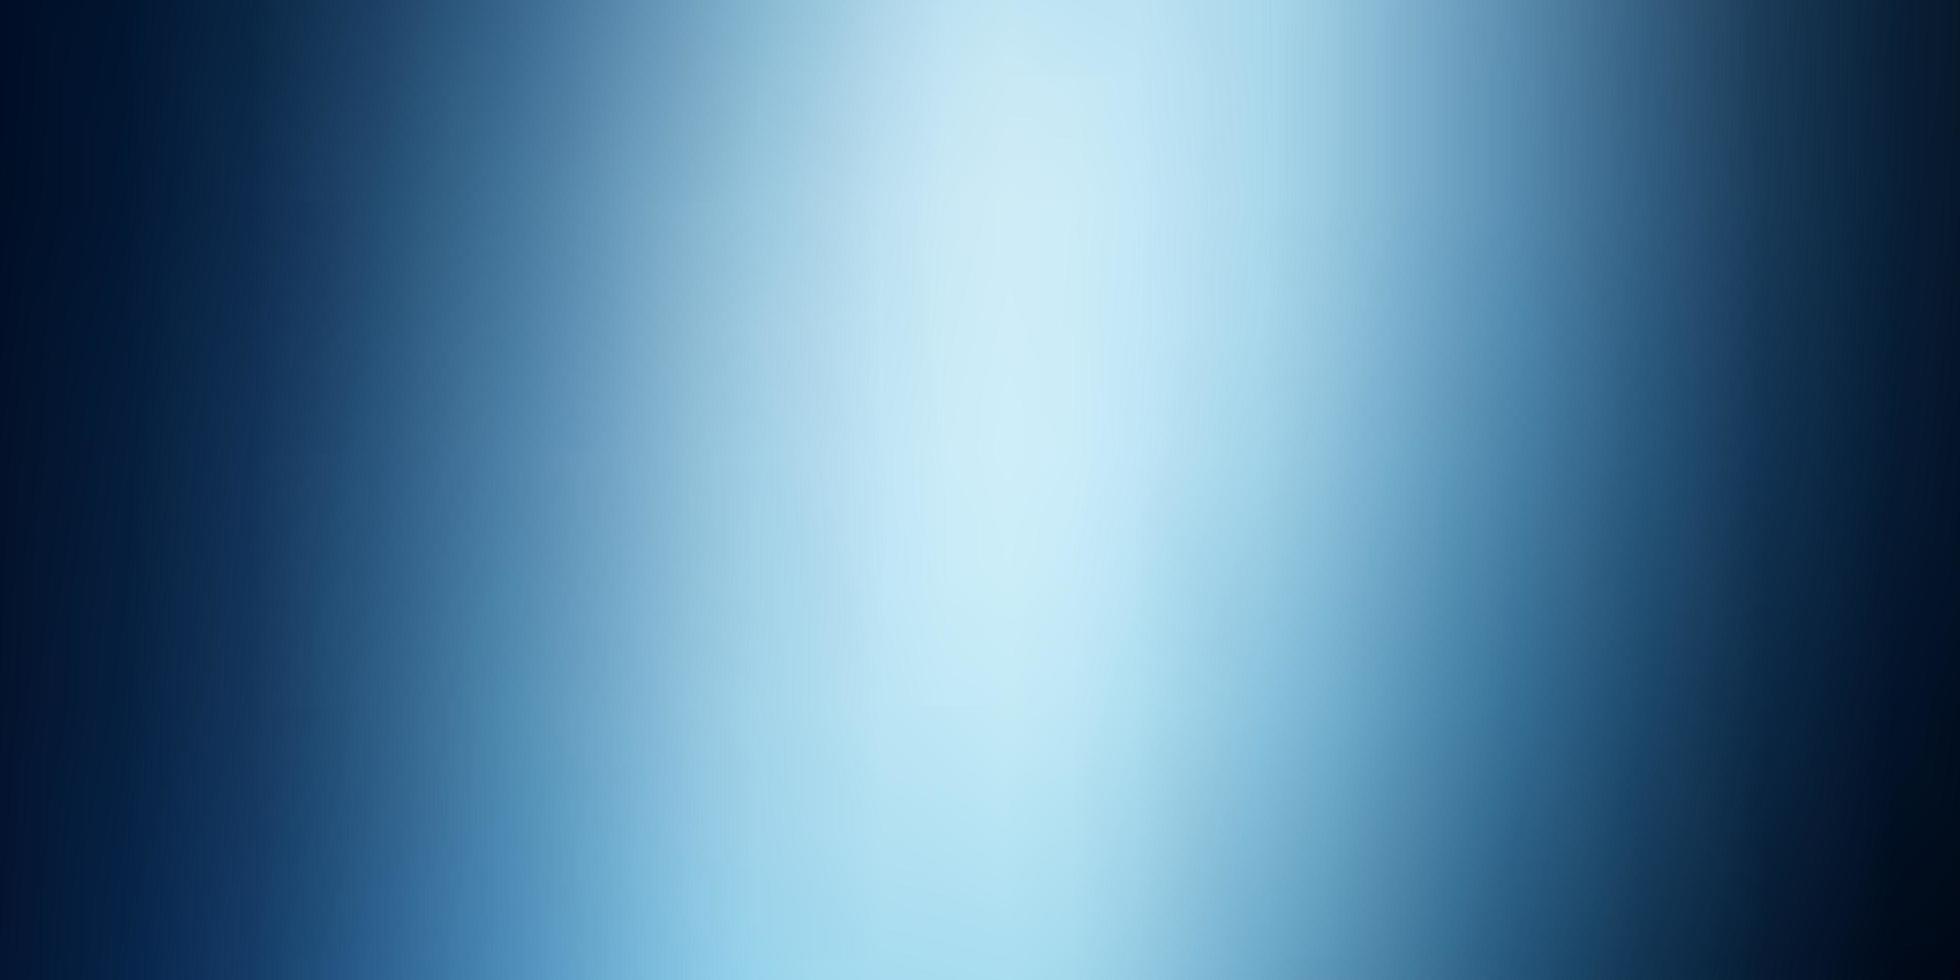 patrón brillante abstracto vector azul claro.